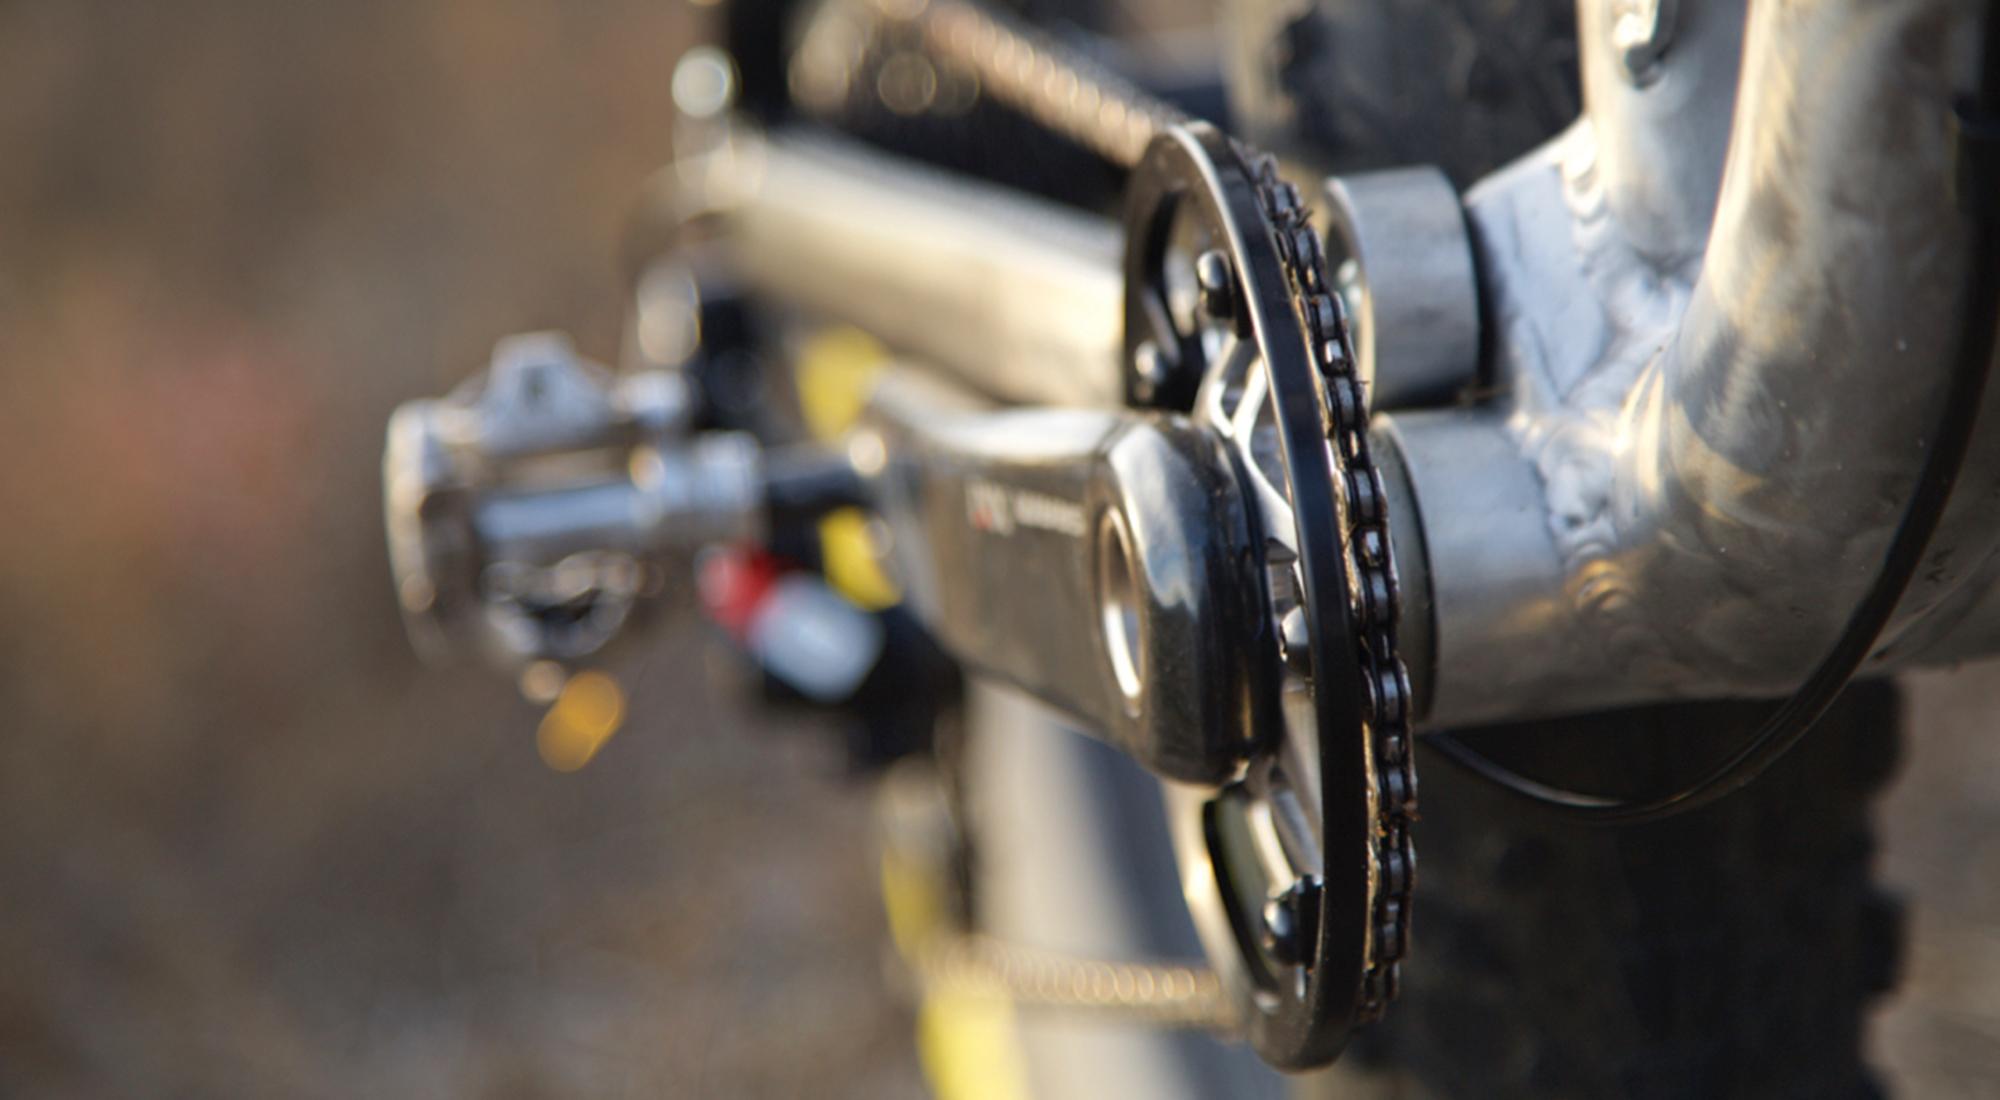 Fat-bike-BB-front-2000x1100px